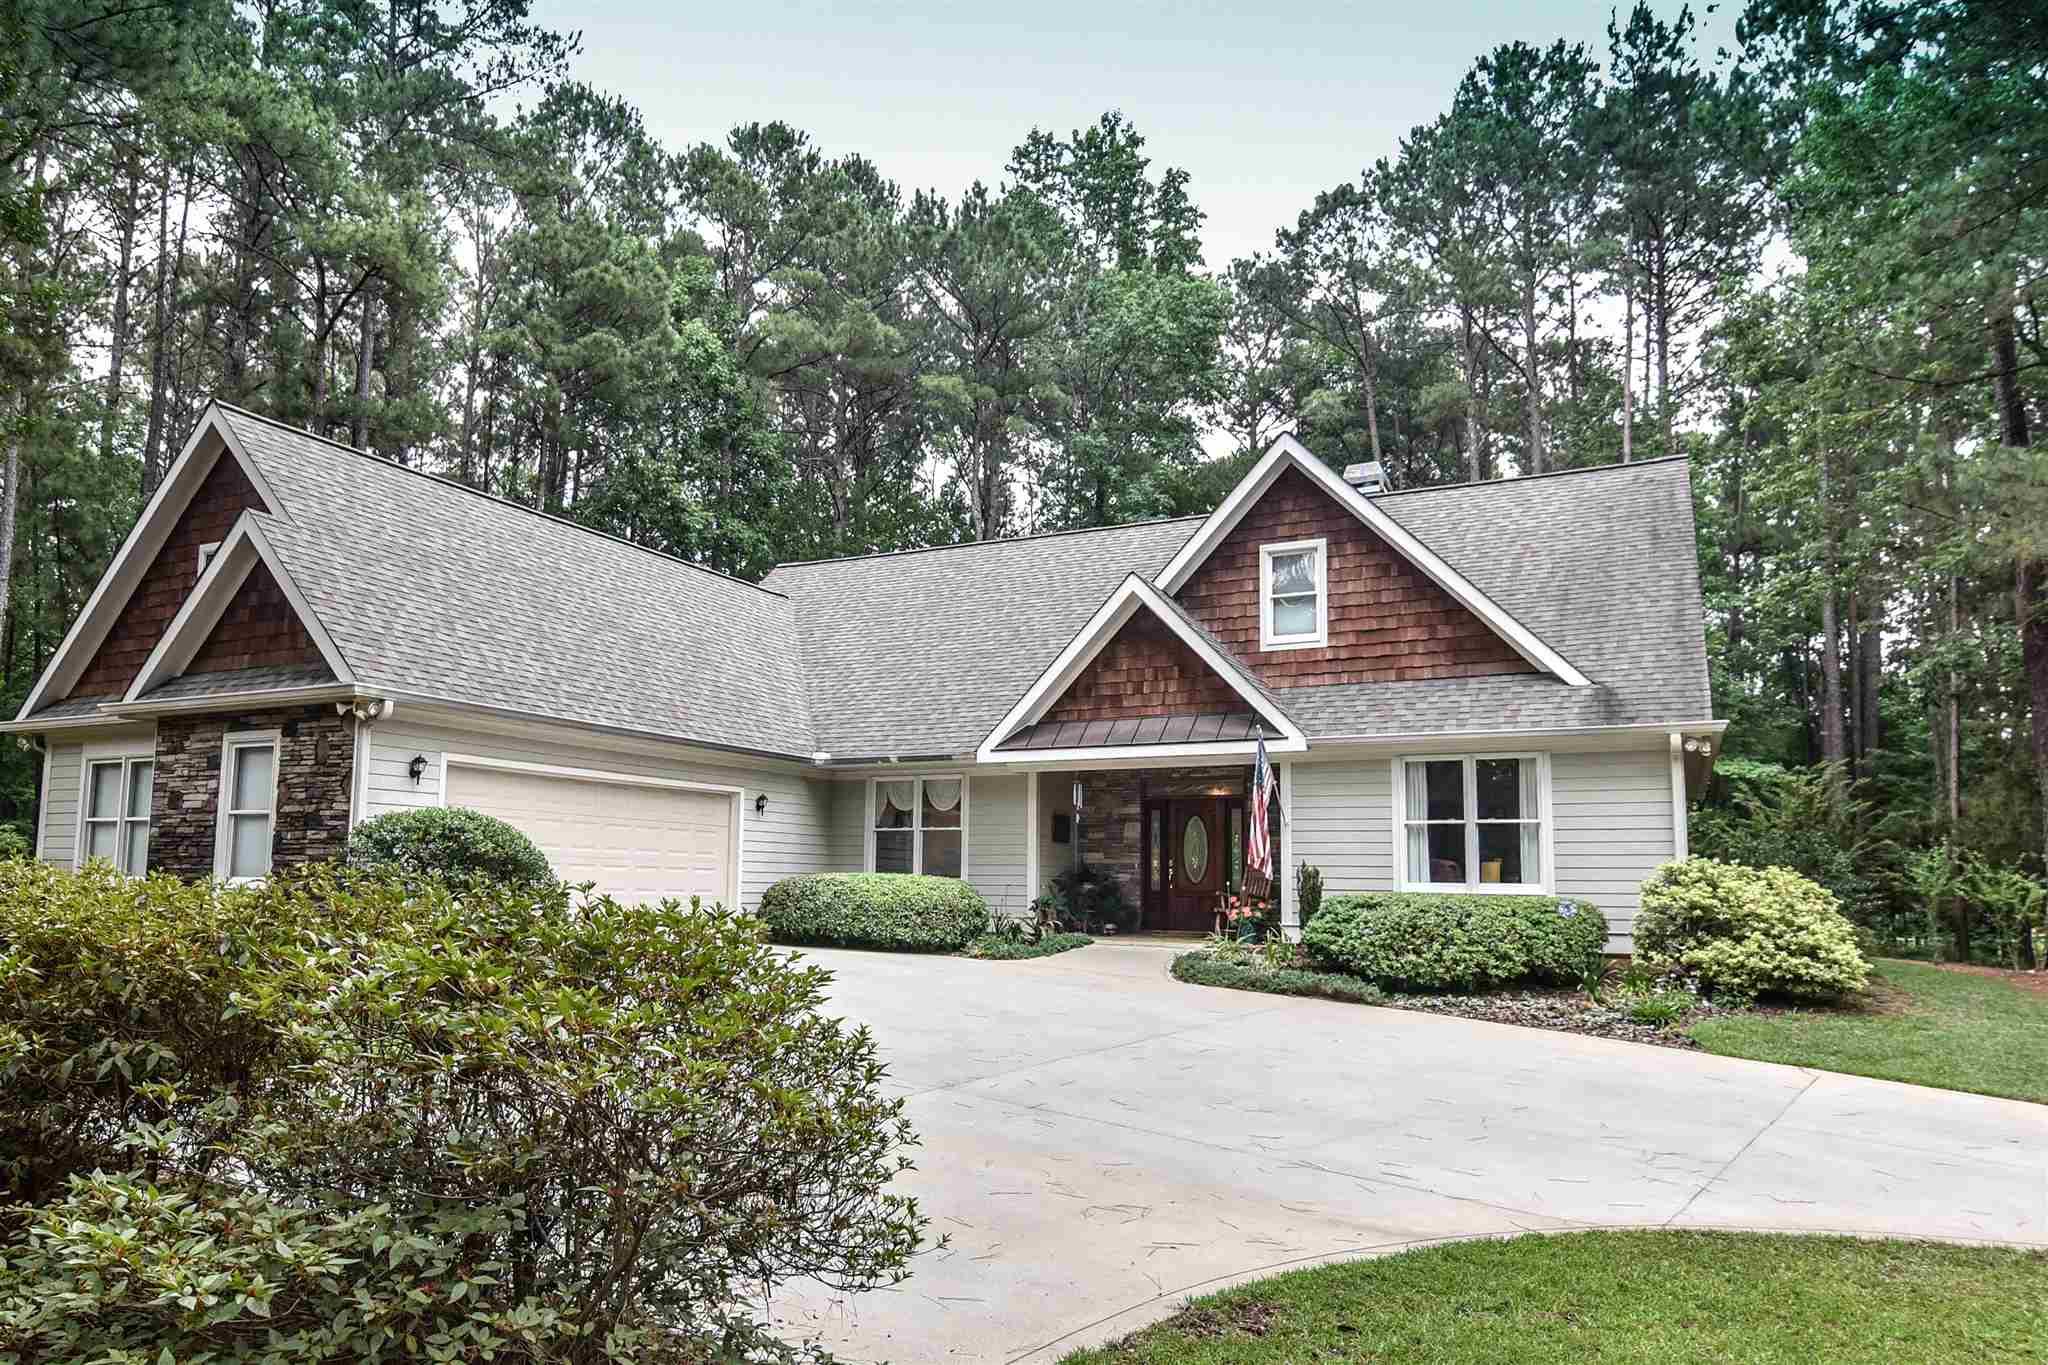 1091 ANCHOR BAY CIRCLE, Lake Oconee Reynolds Landing in Greene County, GA 30642 Home for Sale